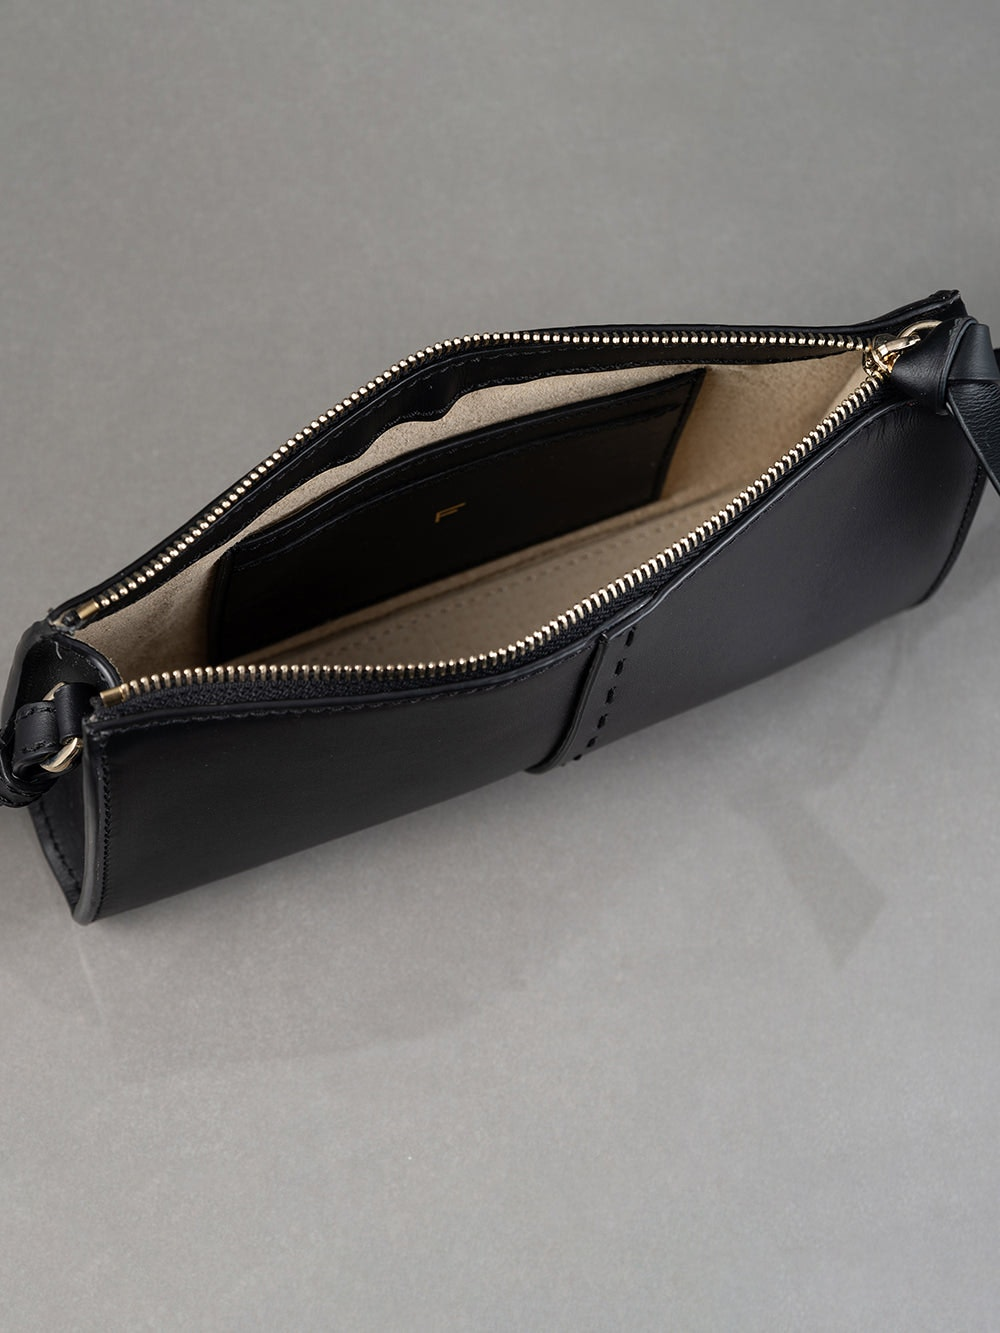 handbag detail view alt:hover